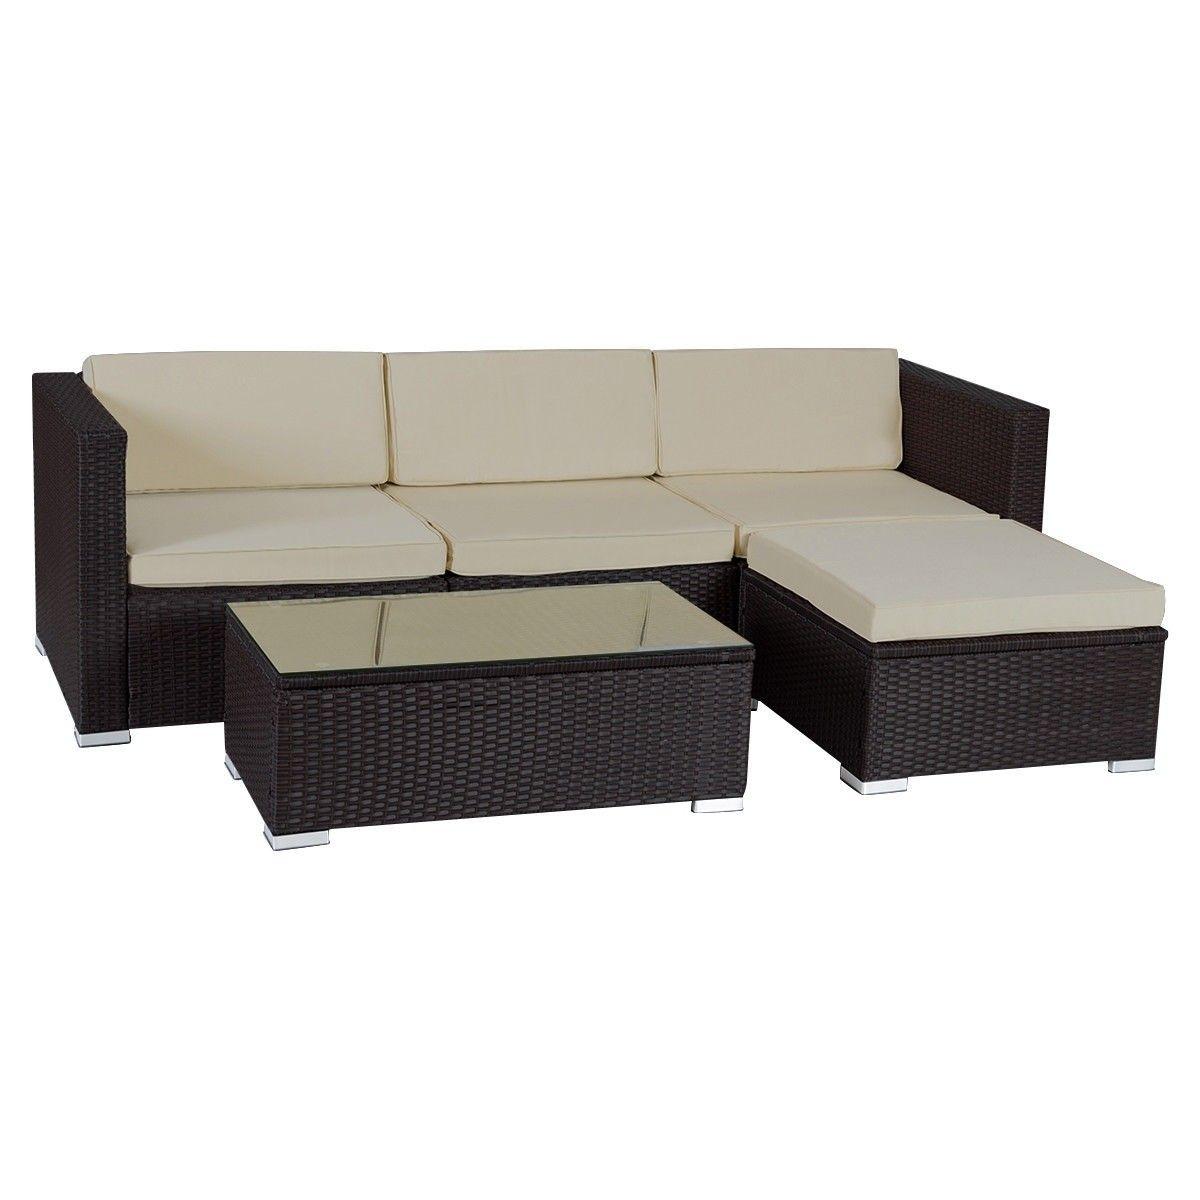 details about 4 pc sectional rattan wicker sofa set patio garden rh pinterest com